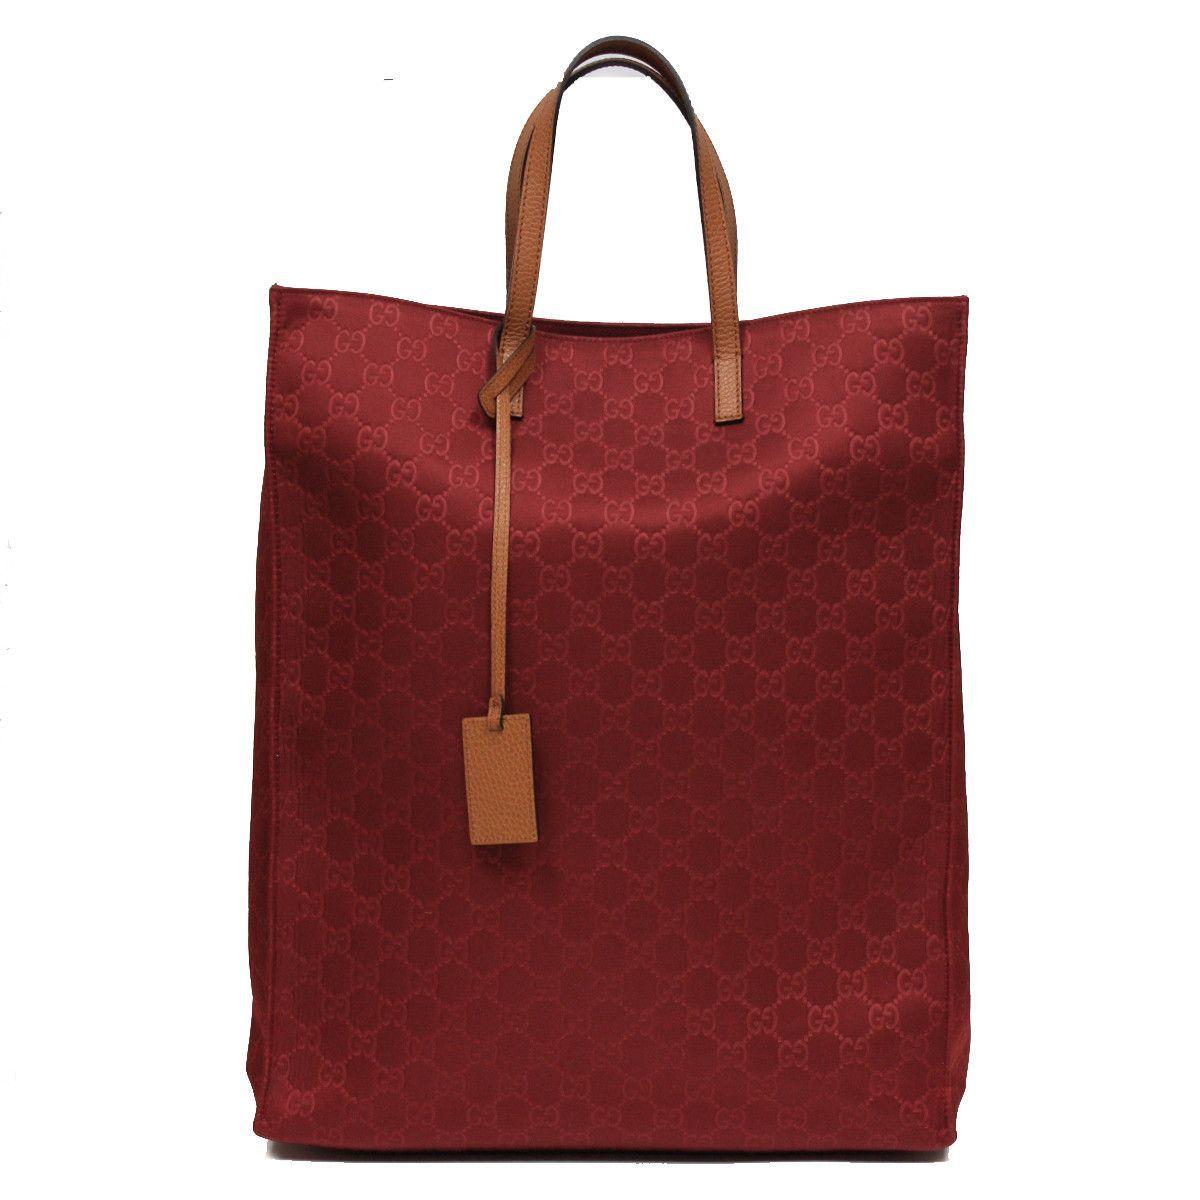 a66b659ae76448 Gucci Burgundy Red Nylon and Leather Travel Tote Beach Bag 355730 ...